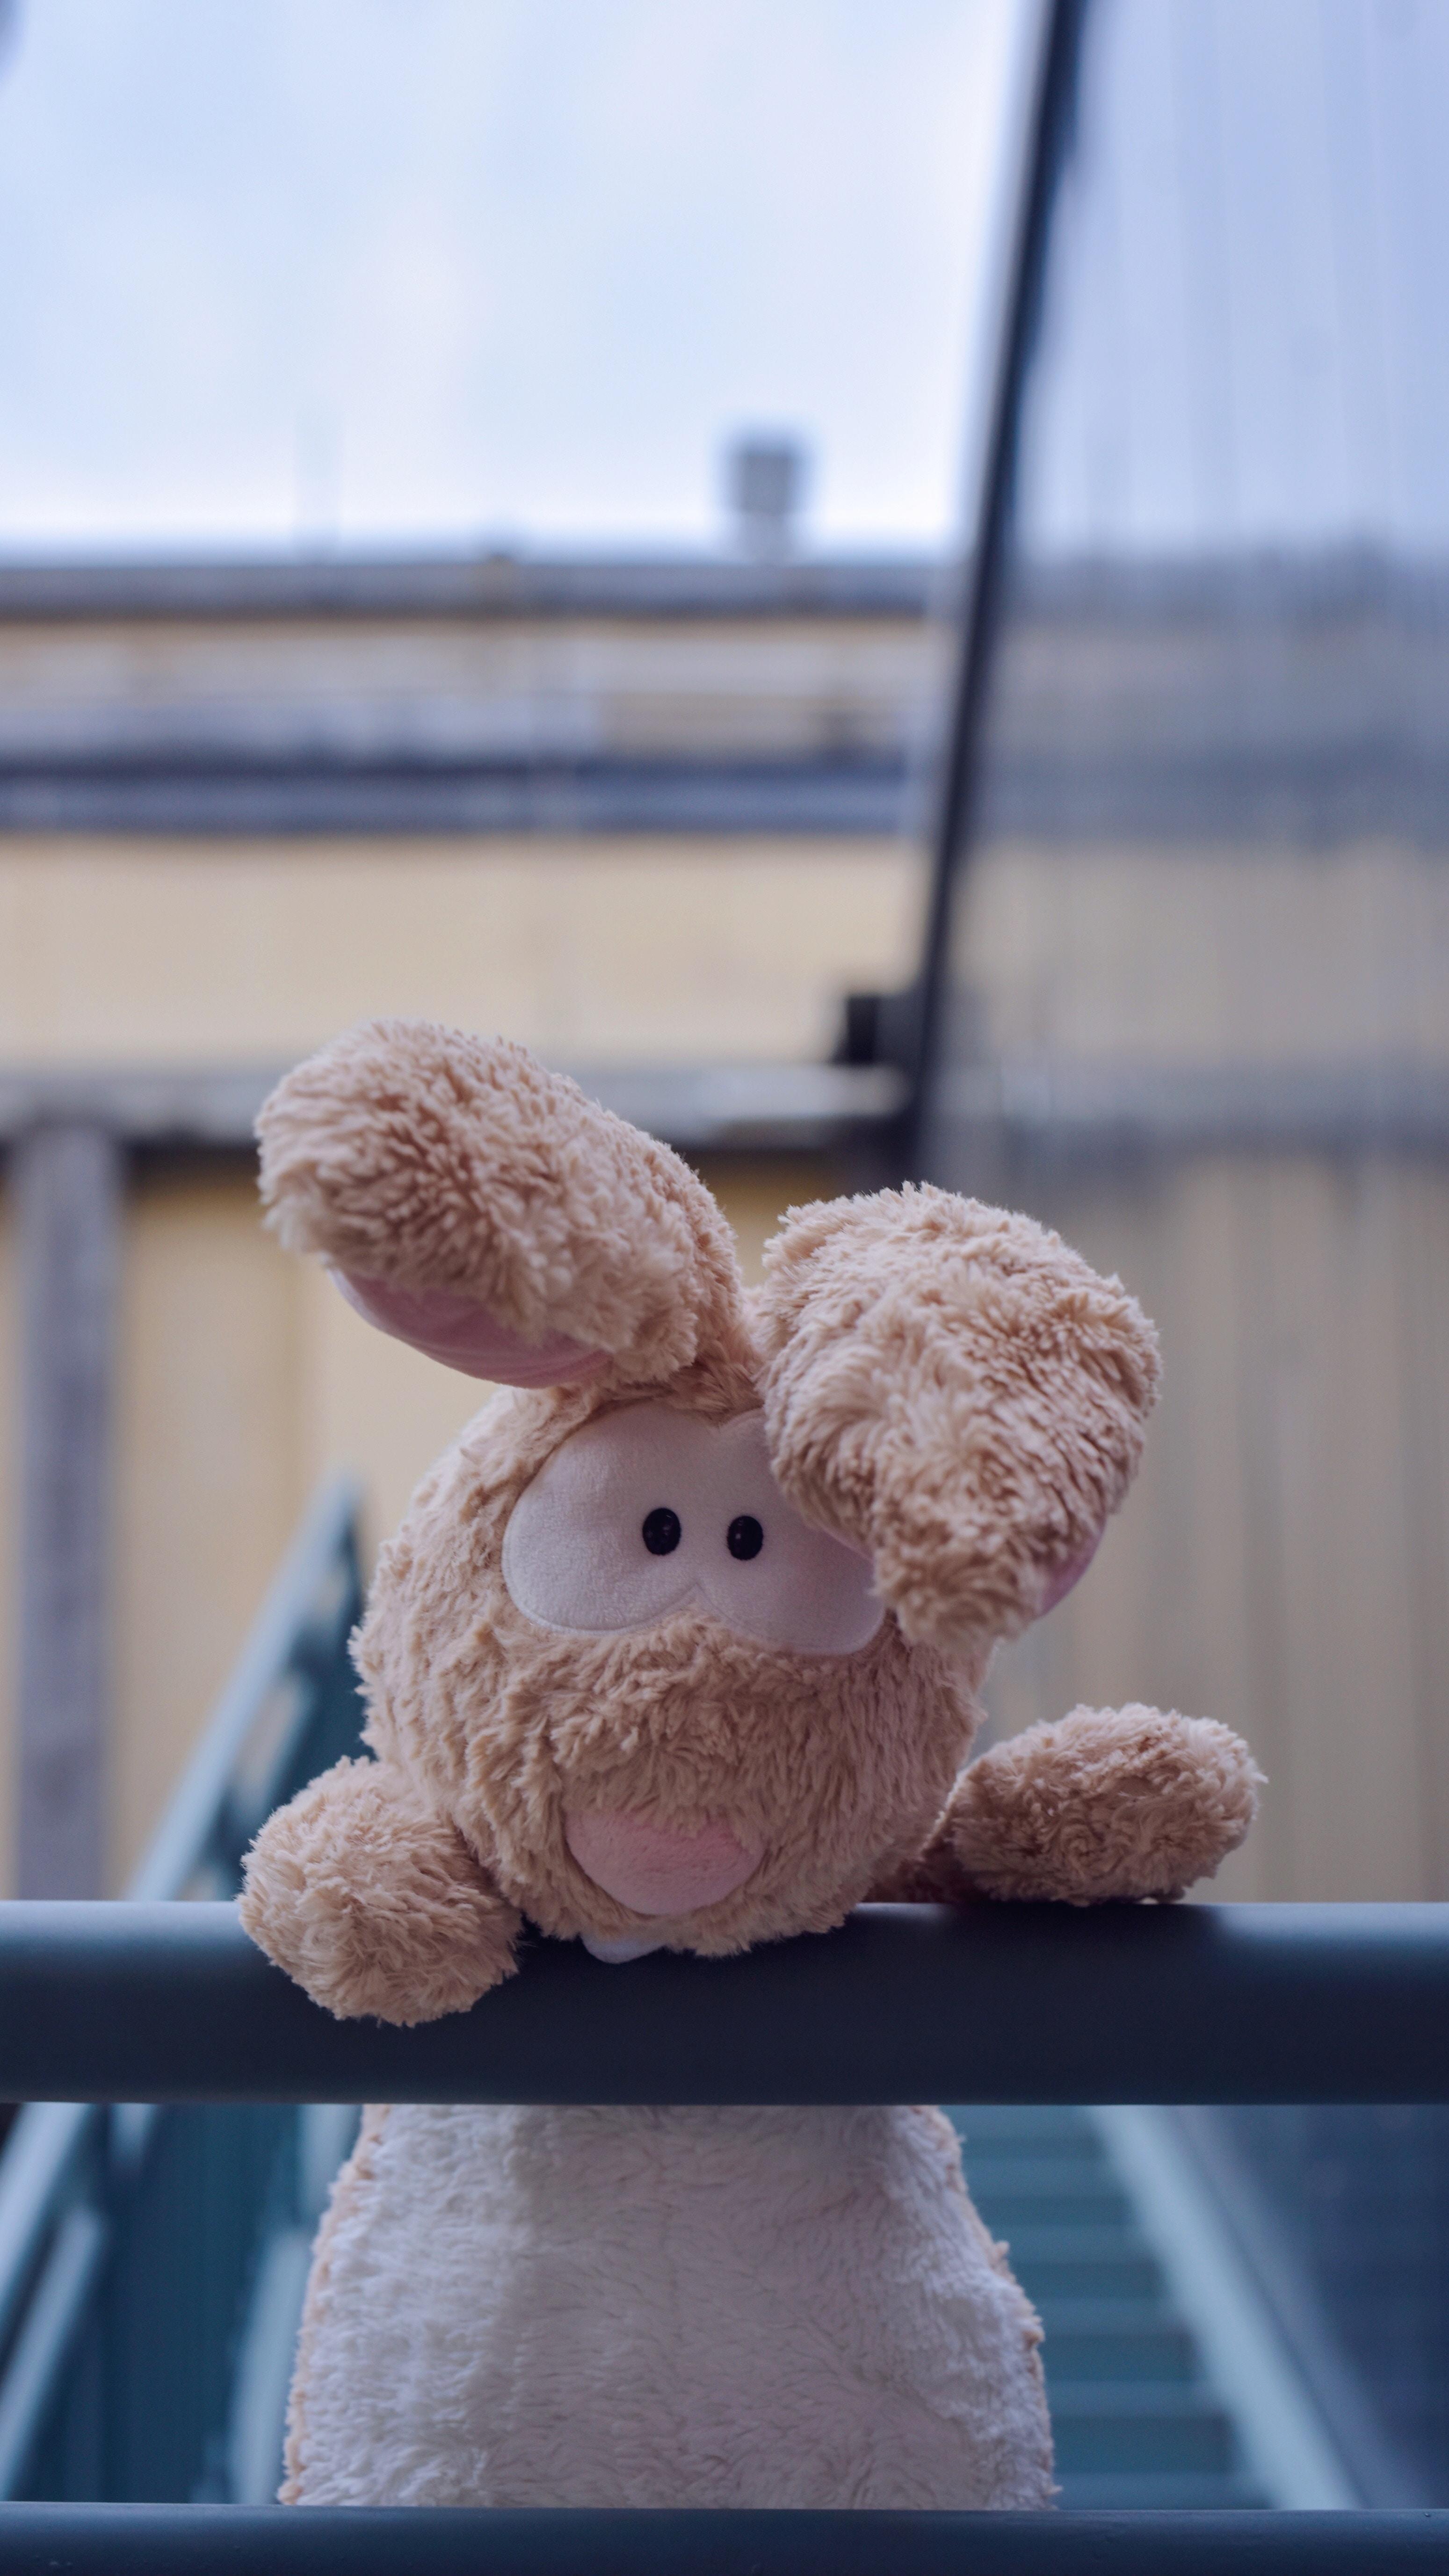 shallow focus of brown animal plush toy